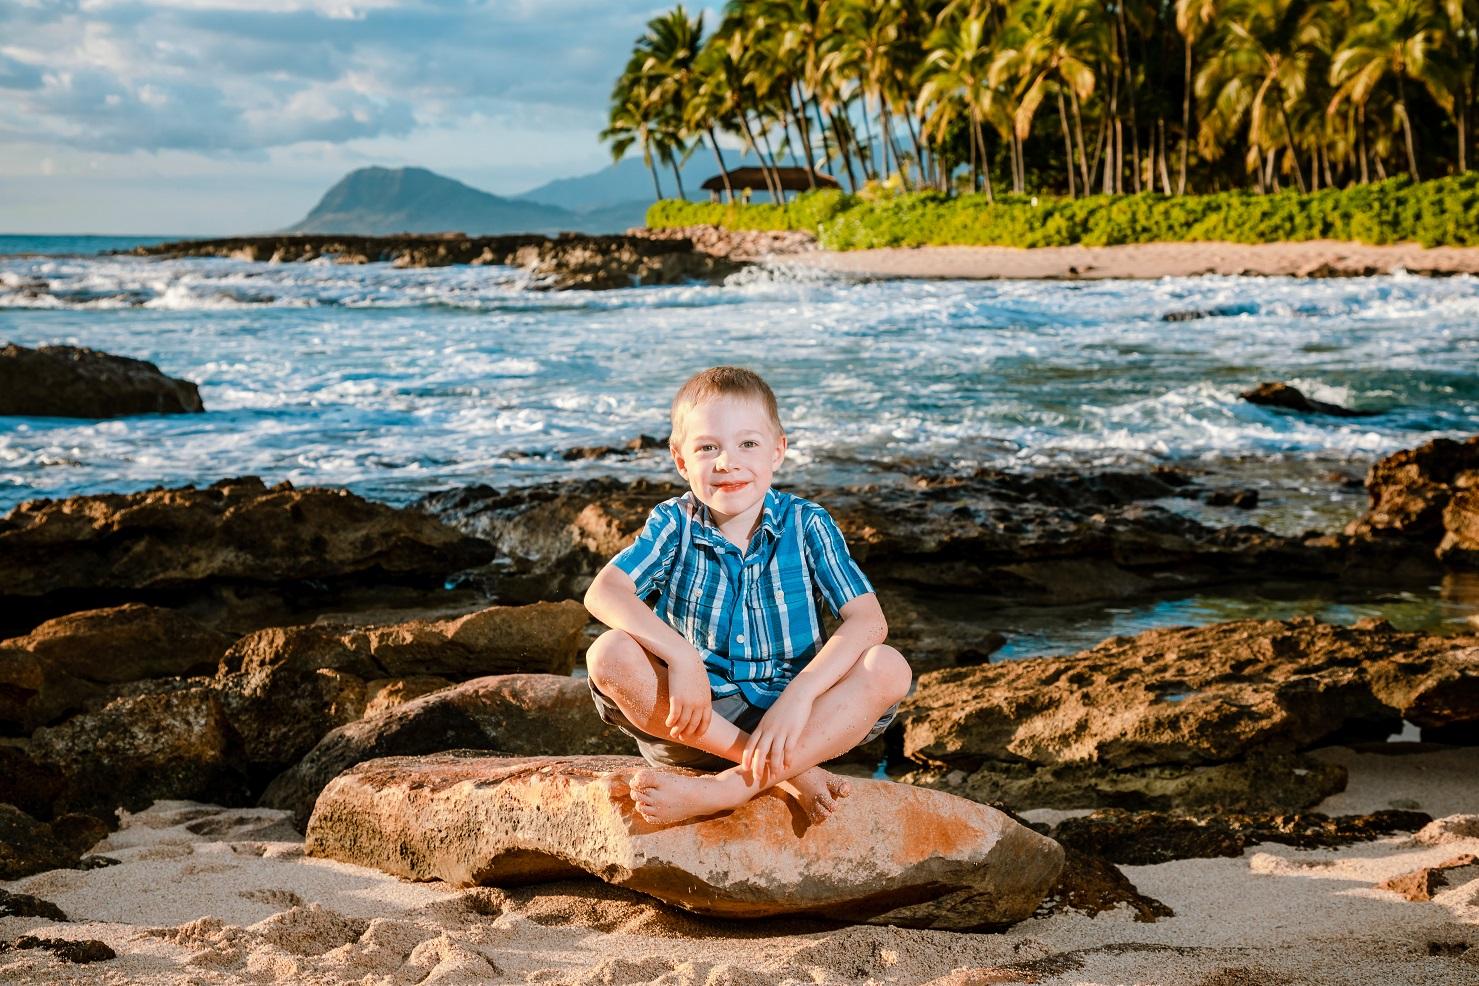 Oahu2018-48477.jpg